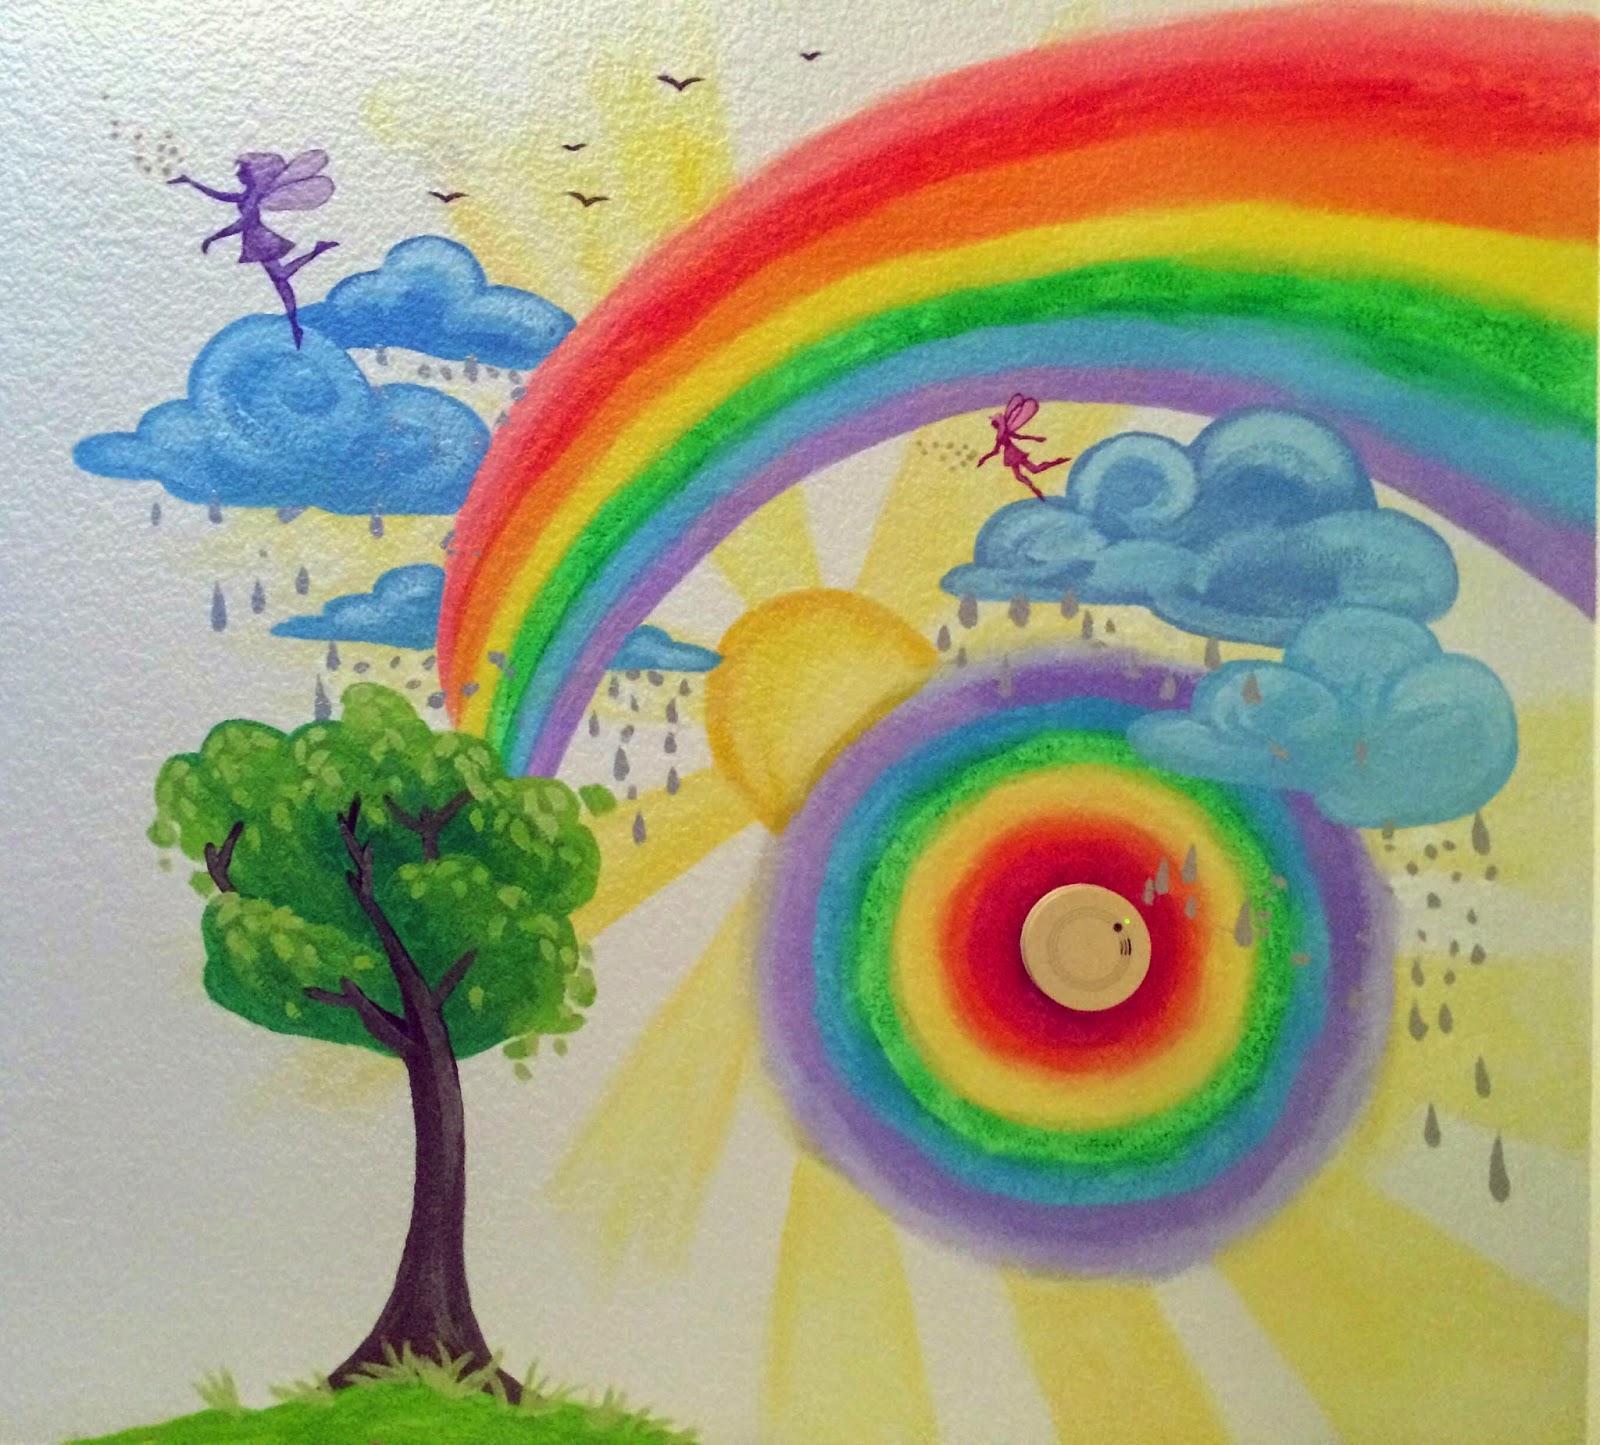 childrens mural, portland muralist, portland mural artist, kids room mural, rainbow mural, fairy mural